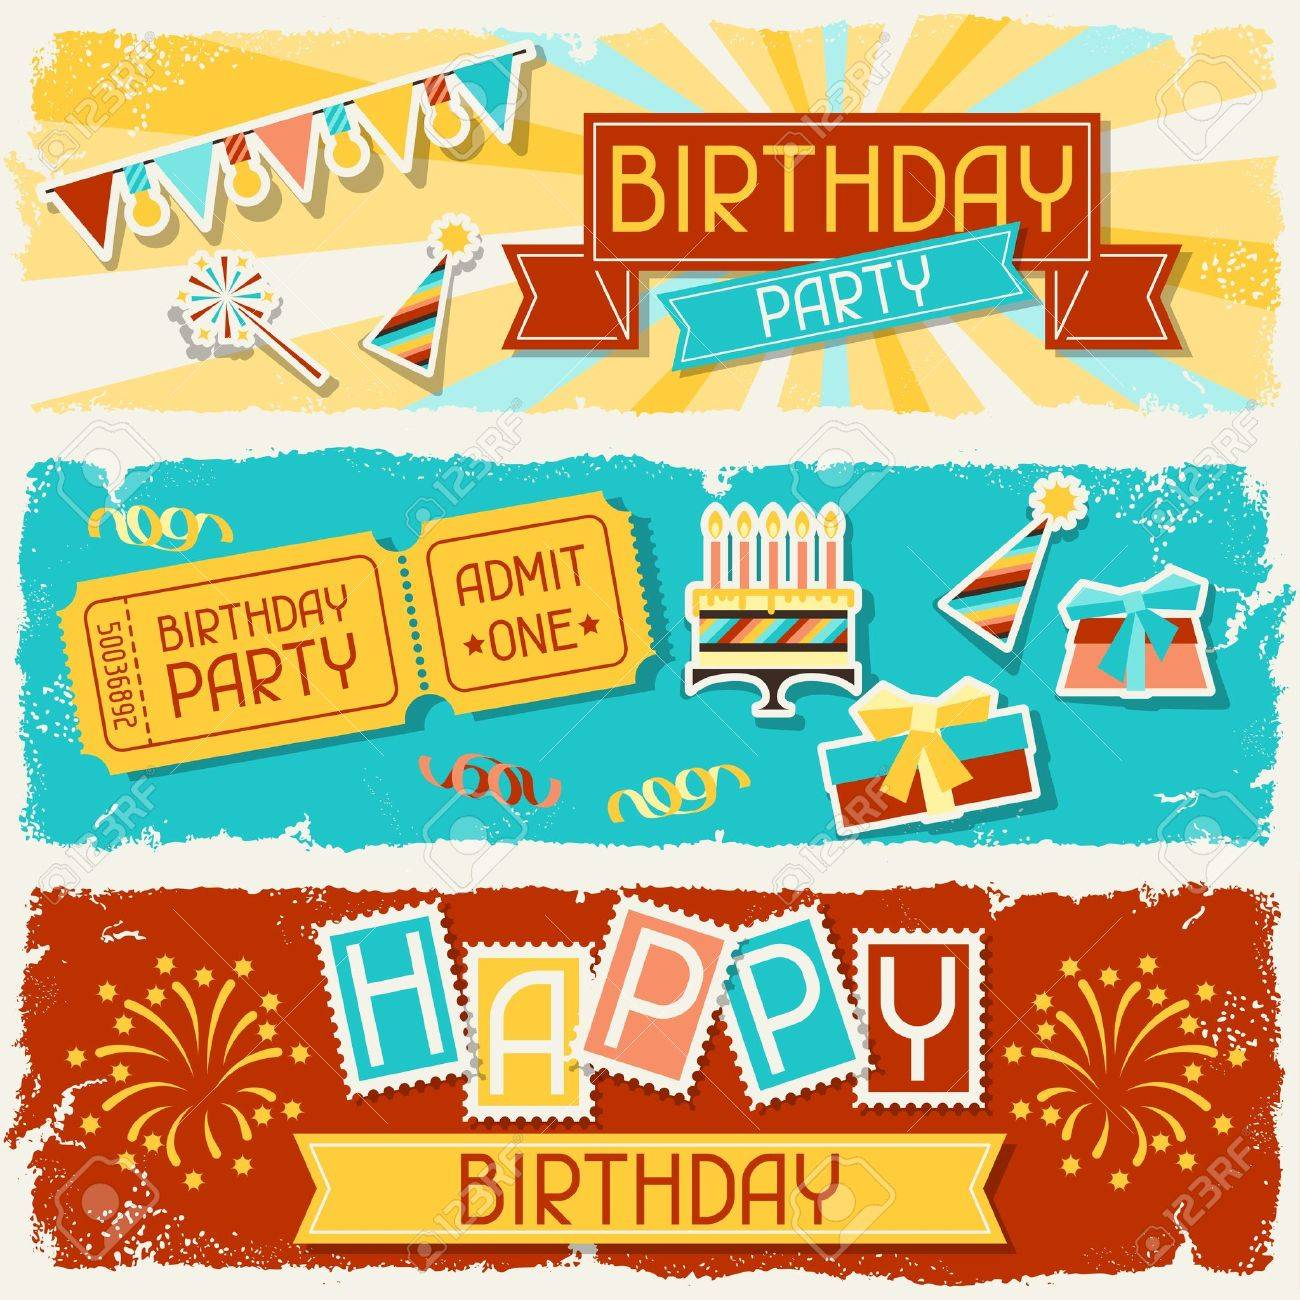 Happy Birthday horizontal banners. Stock Vector - 20503149